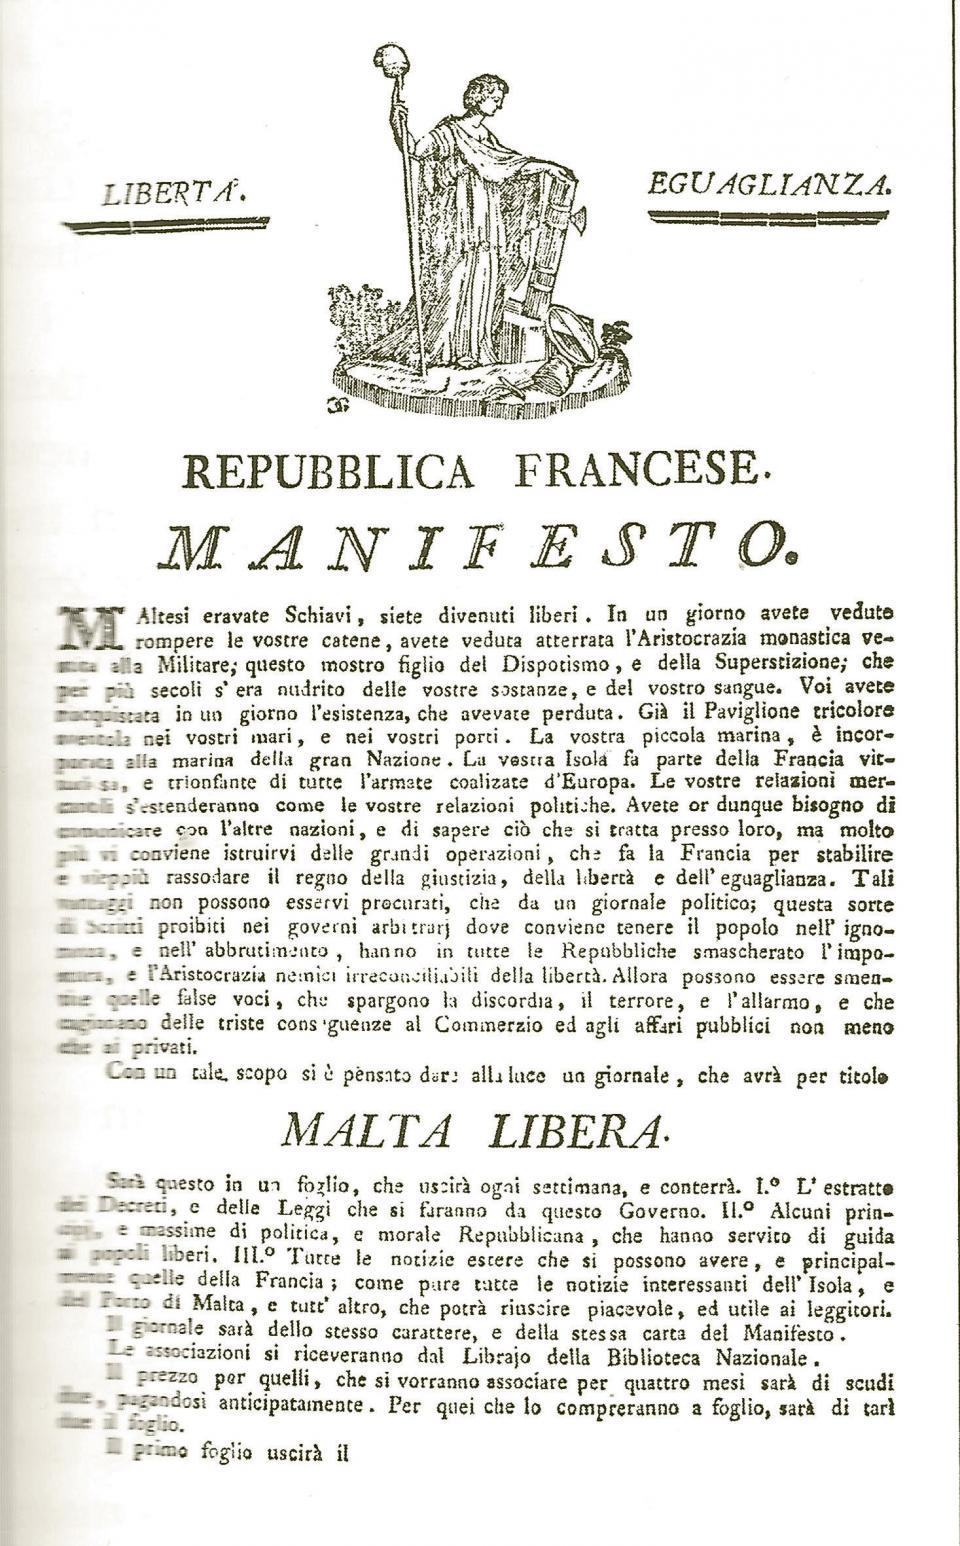 The manifesto of the Malta Libera. Courtesy of the National Library of Malta